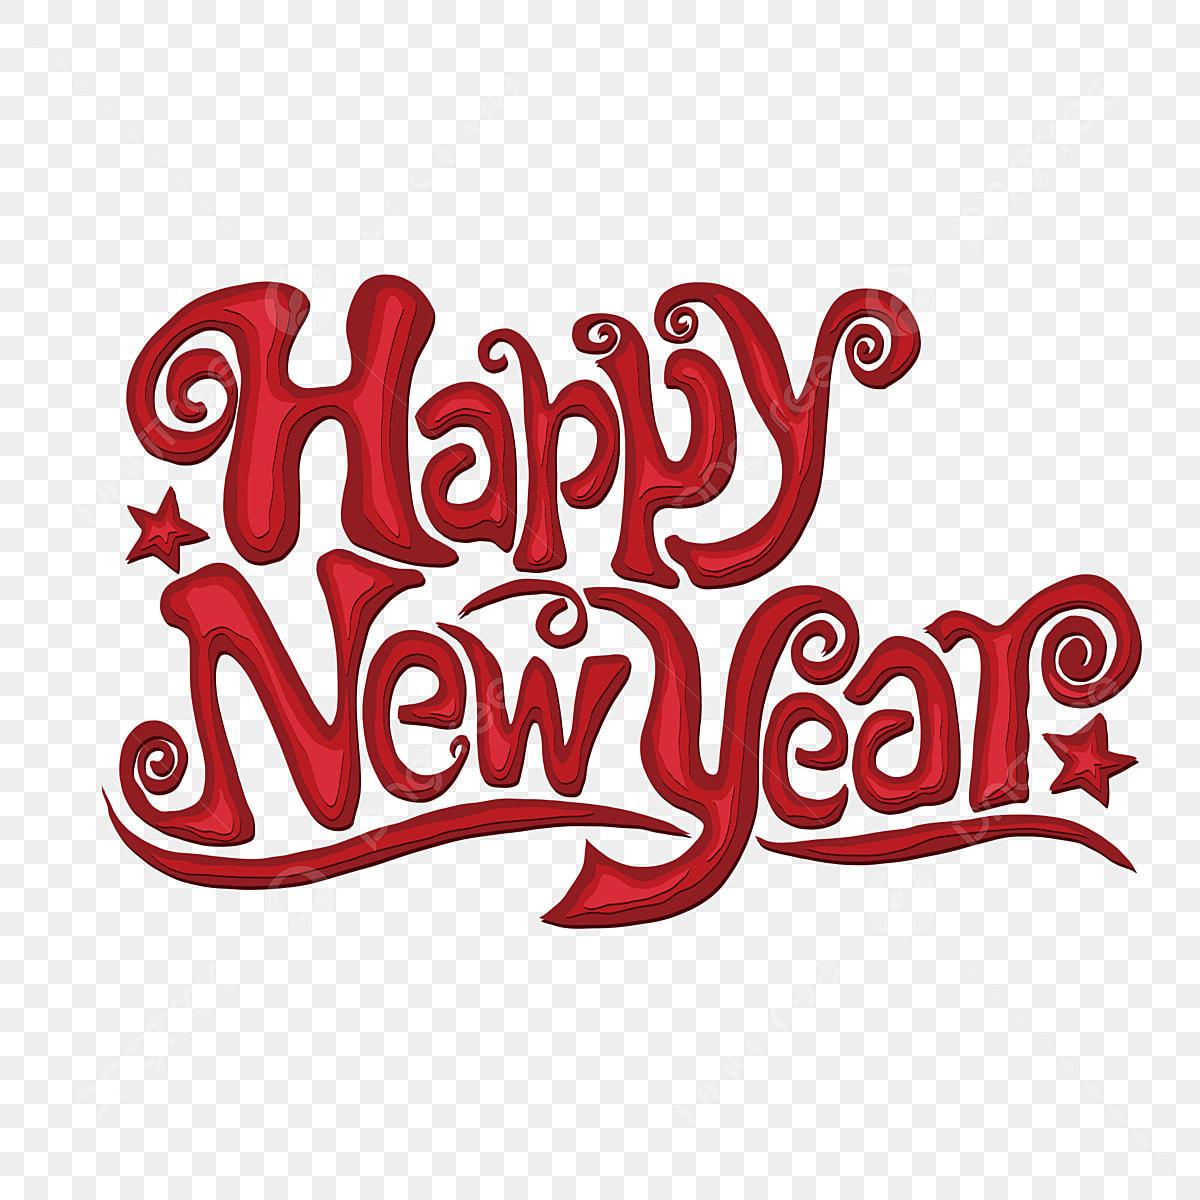 2015 Happy New Year فن الخط باللغة الإنجليزية Happy New Year Cdr White 2015 سنة جديدة سعيدة الخط 2015 Png وملف Psd للتحميل مجانا